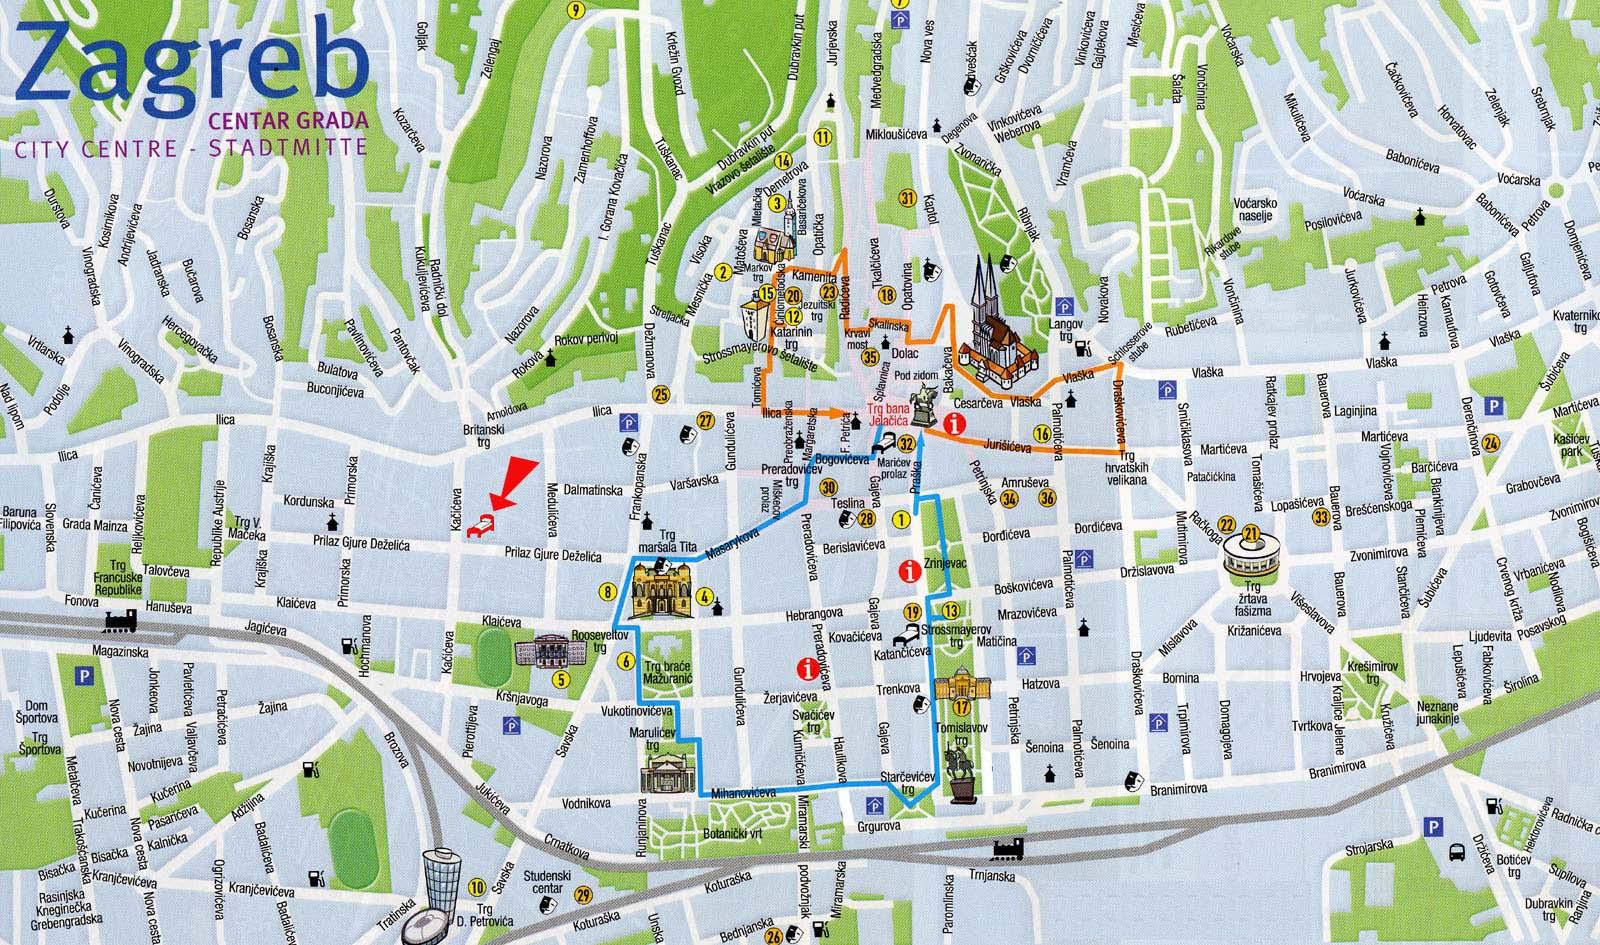 zagreb mapa Mapas de Zagreb   Croácia | MapasBlog zagreb mapa